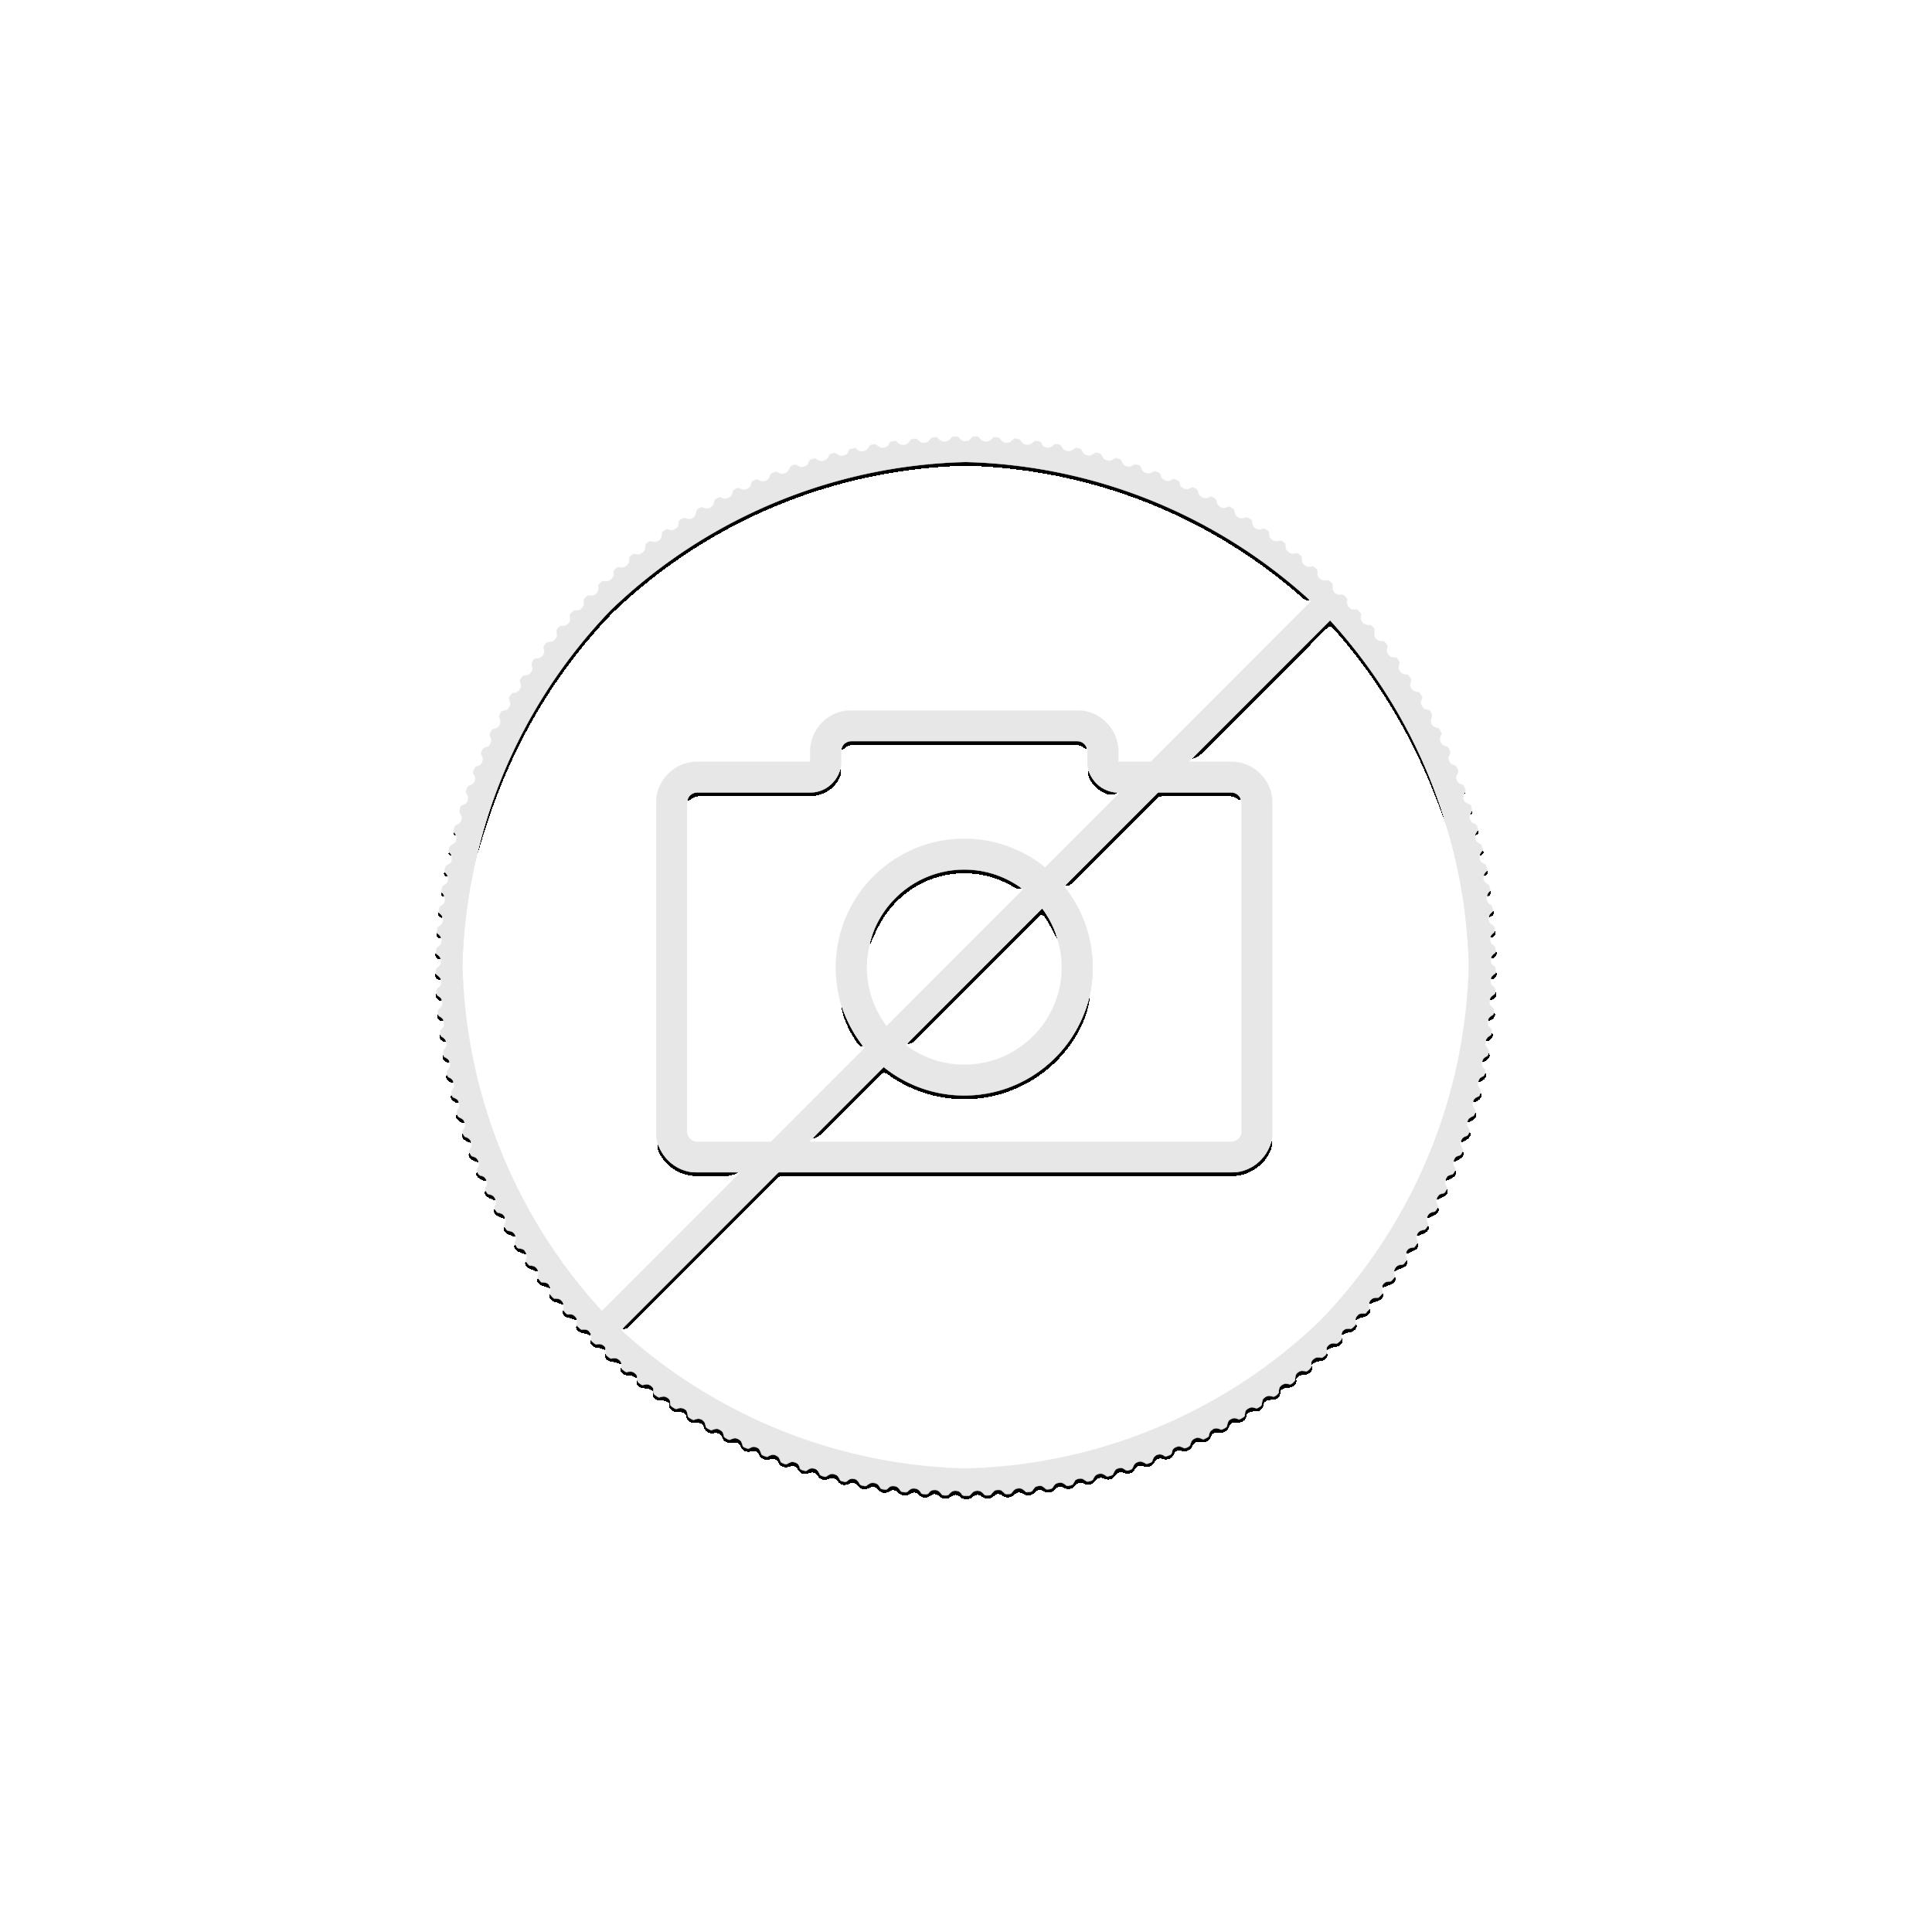 5 Troy ounce silver coin Koala 2020 Proof